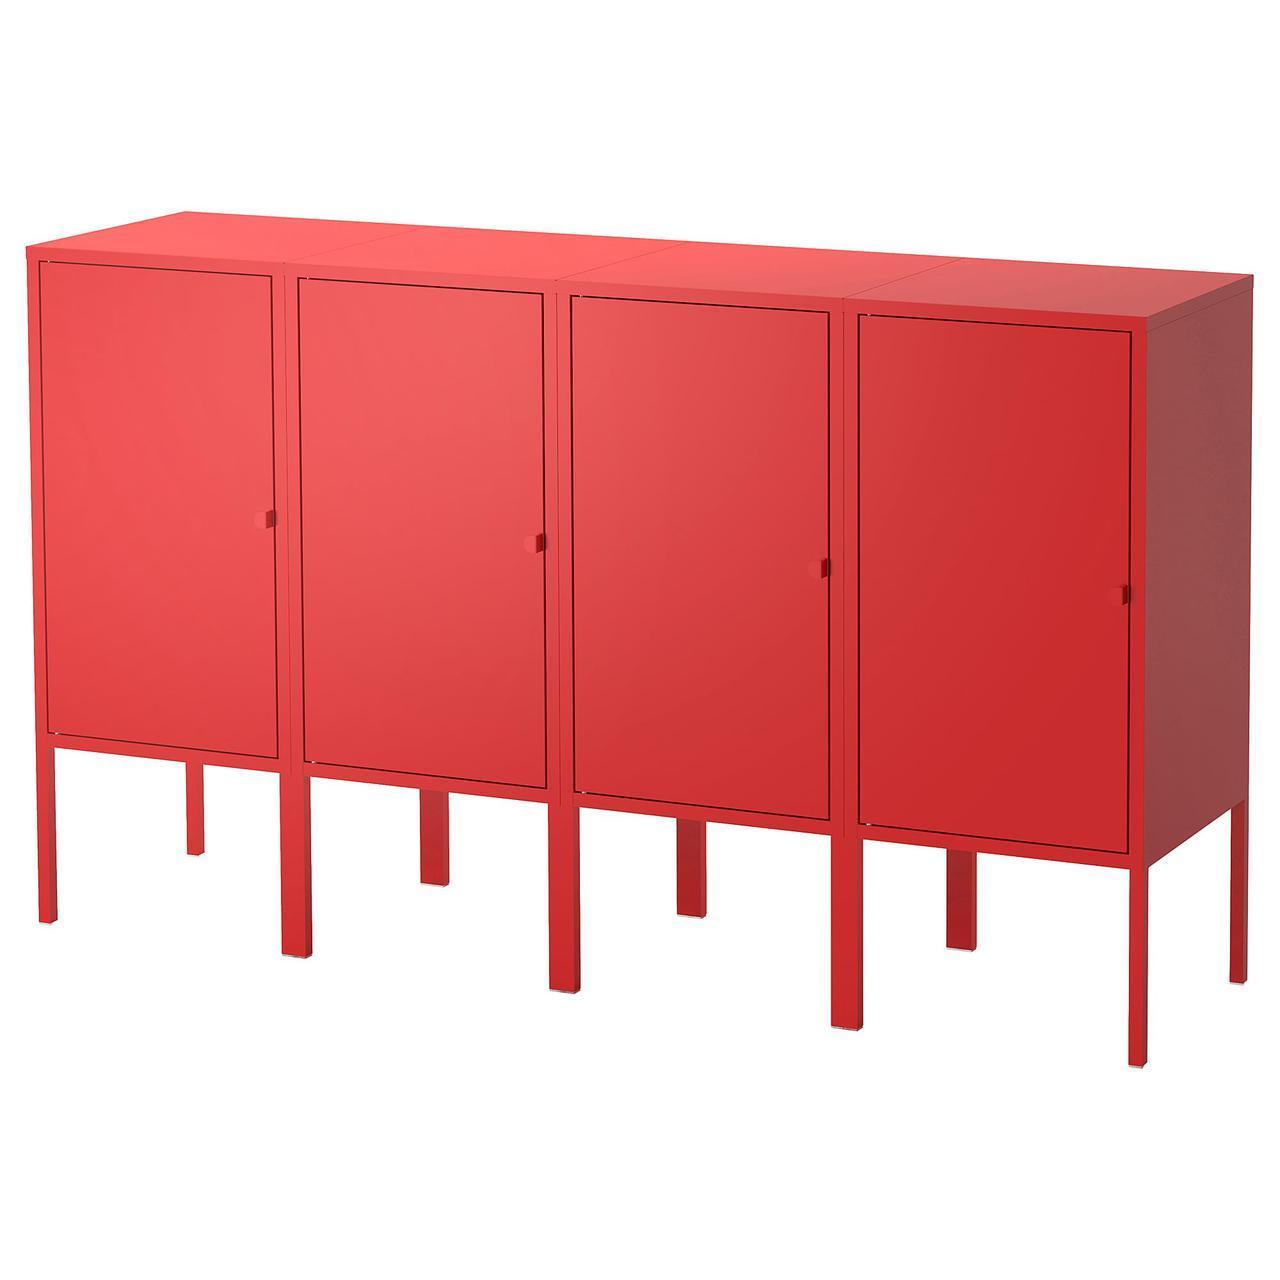 IKEA LIXHULT (992.488.70) Шкаф, темно-синий